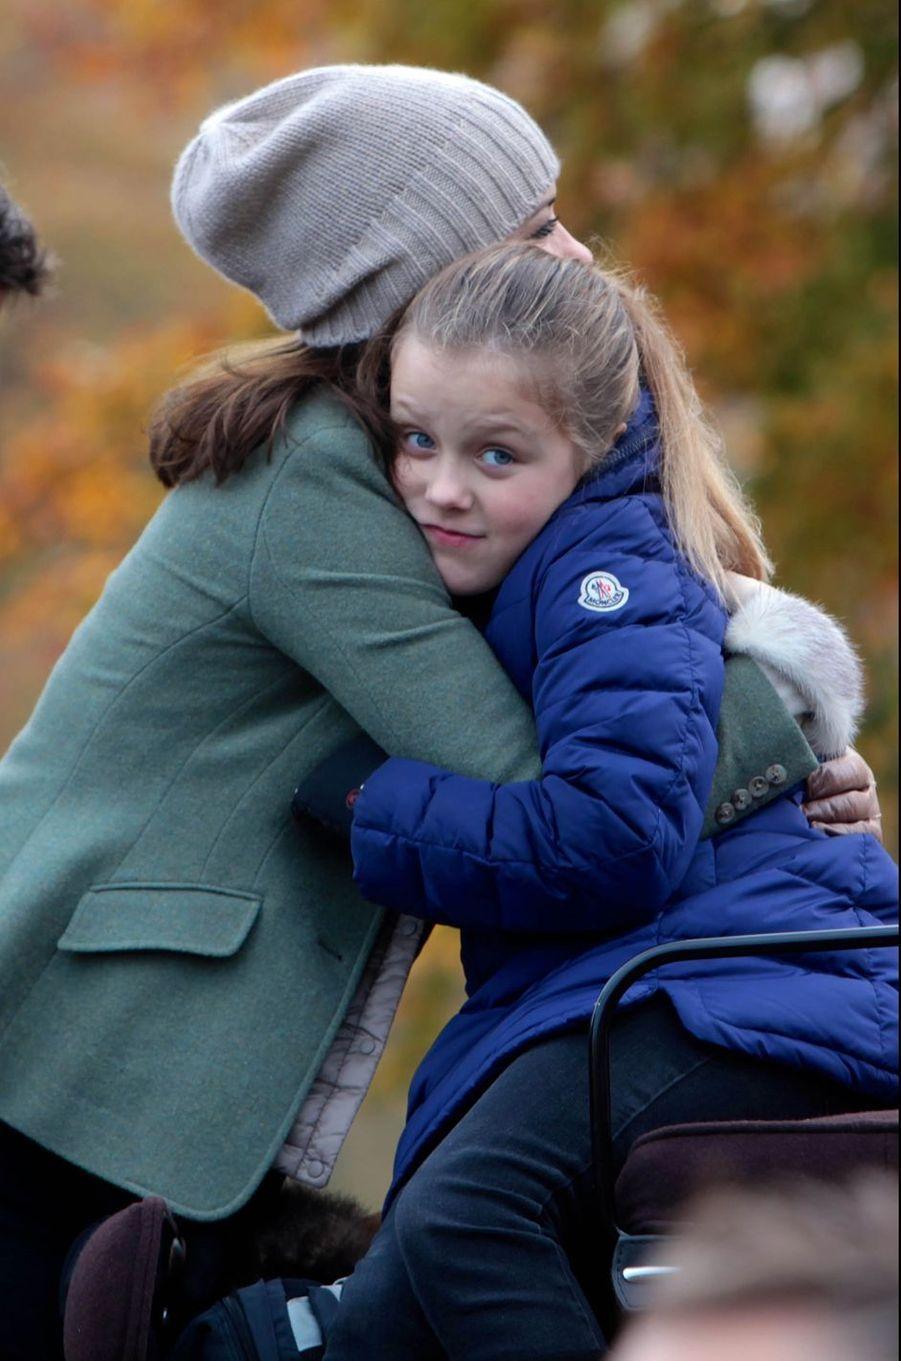 La princesse Isabella de Danemark avec sa mère la princesse Mary, le 1er novembre 2015